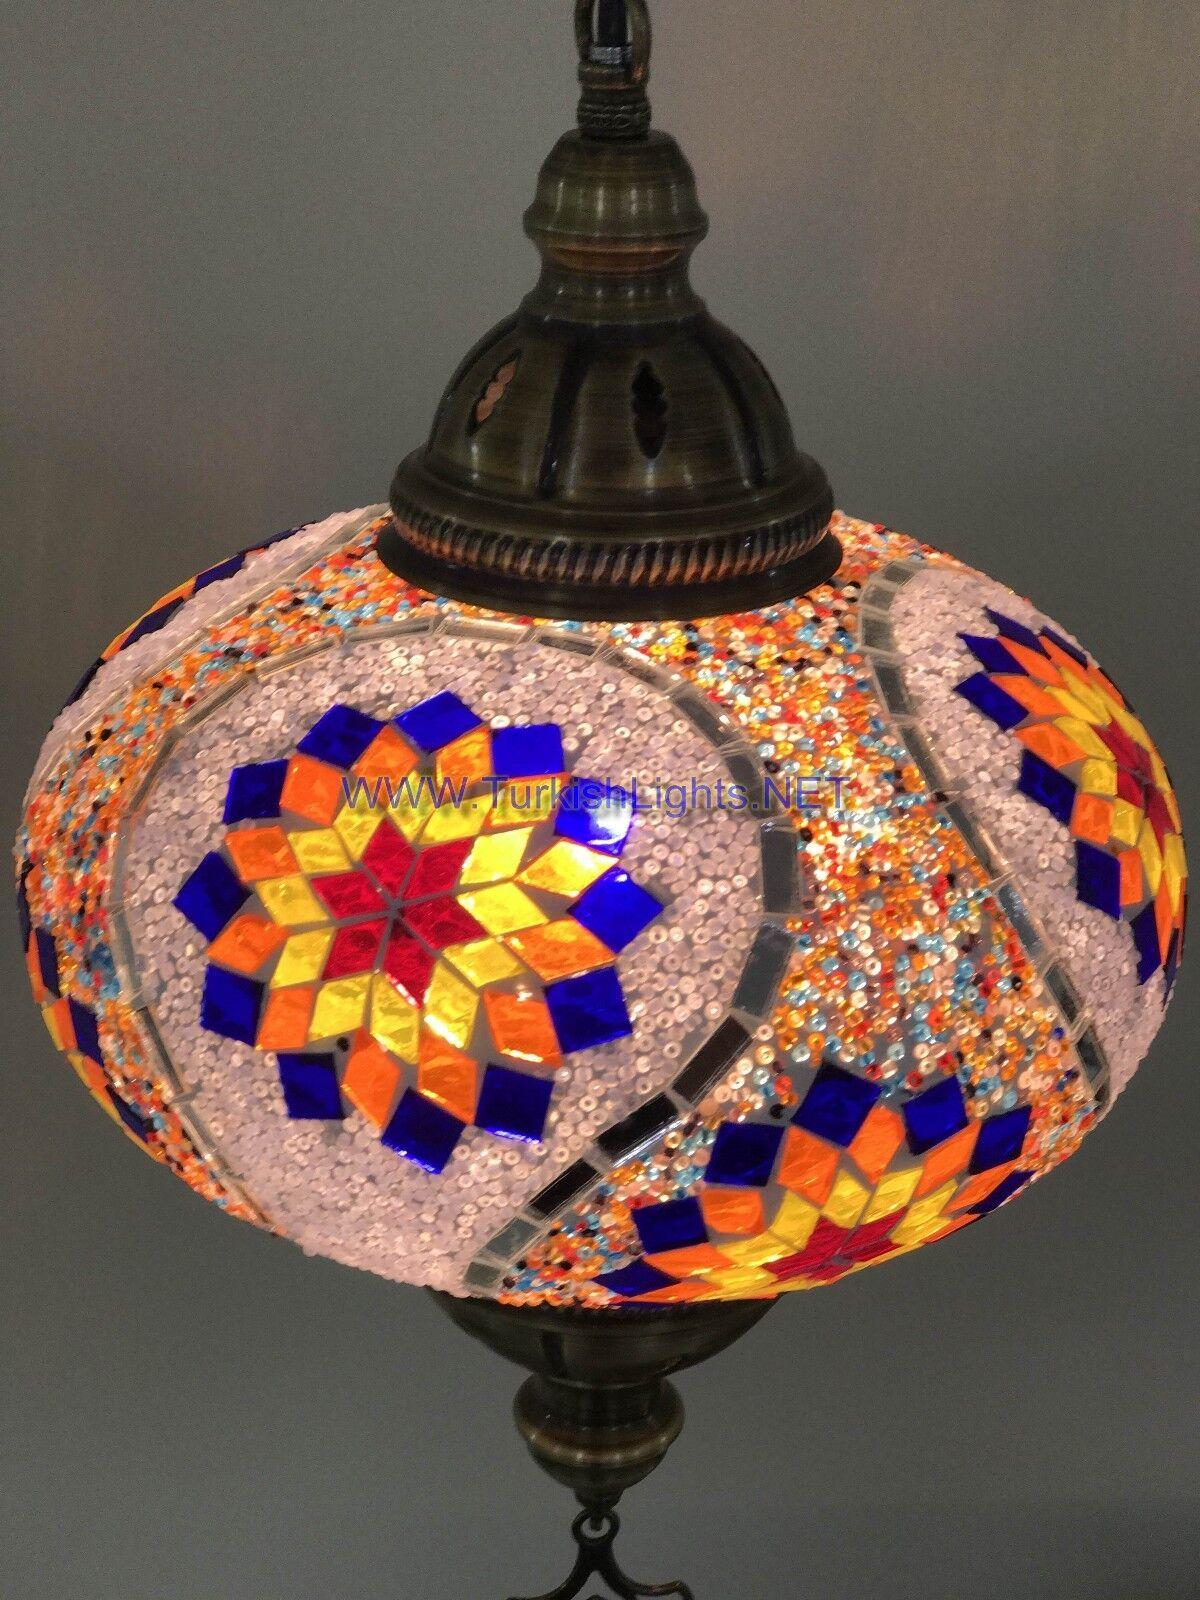 Turque Handmade Lampe Mosaïque pendant Lampe Handmade Extra Large Globe (No5 Globe) 9e7603